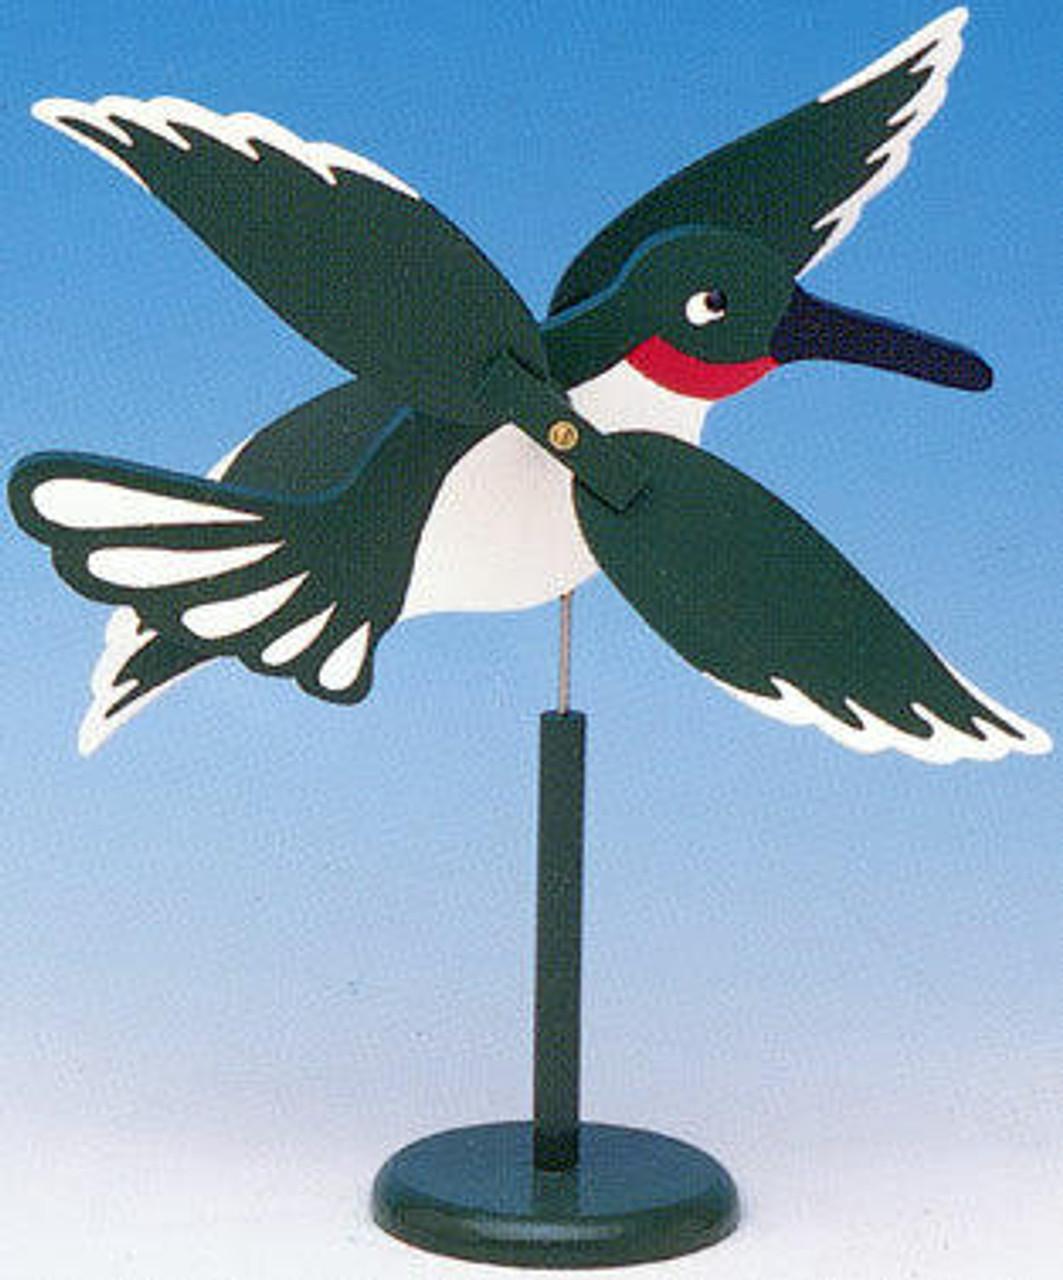 Cherry Tree Toys Hummingbird Whirligig Plan